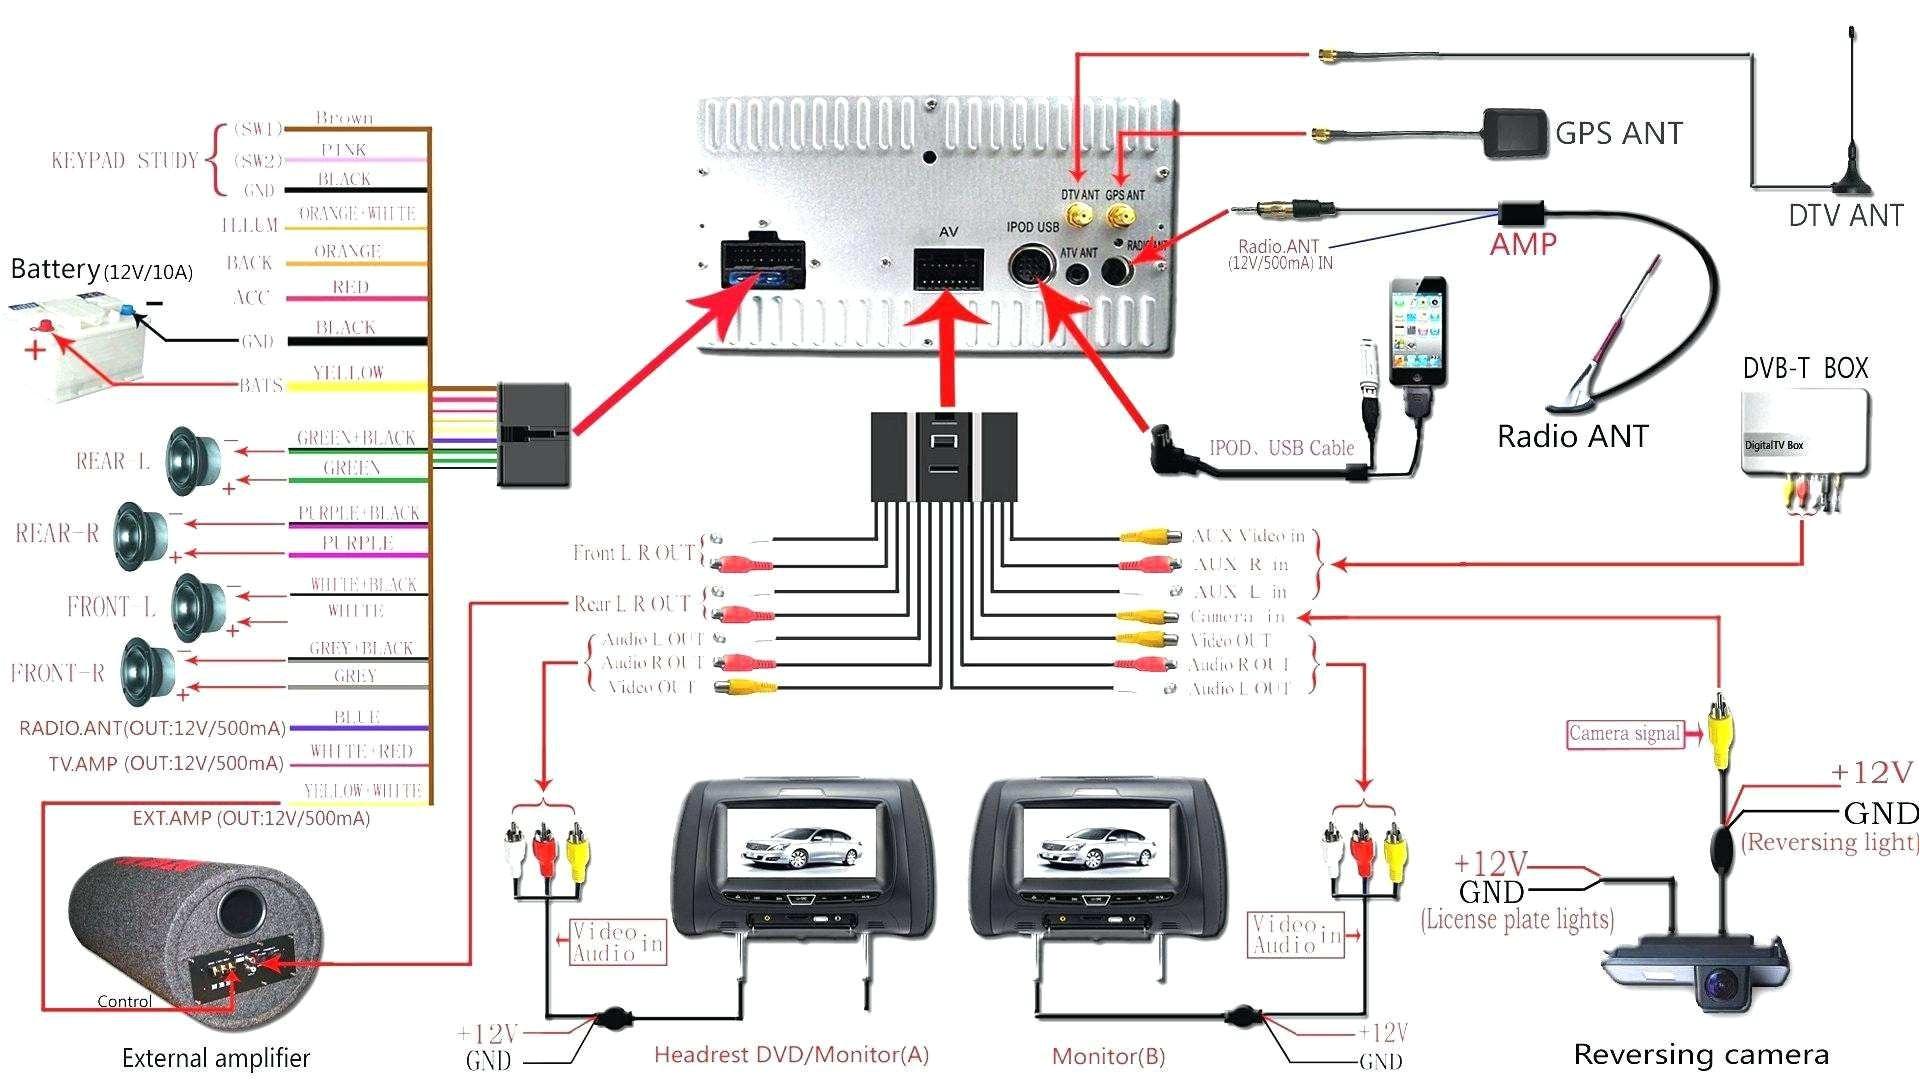 att router wiring diagram wiring diagram technic att uverse router wiring diagram att router wiring diagram